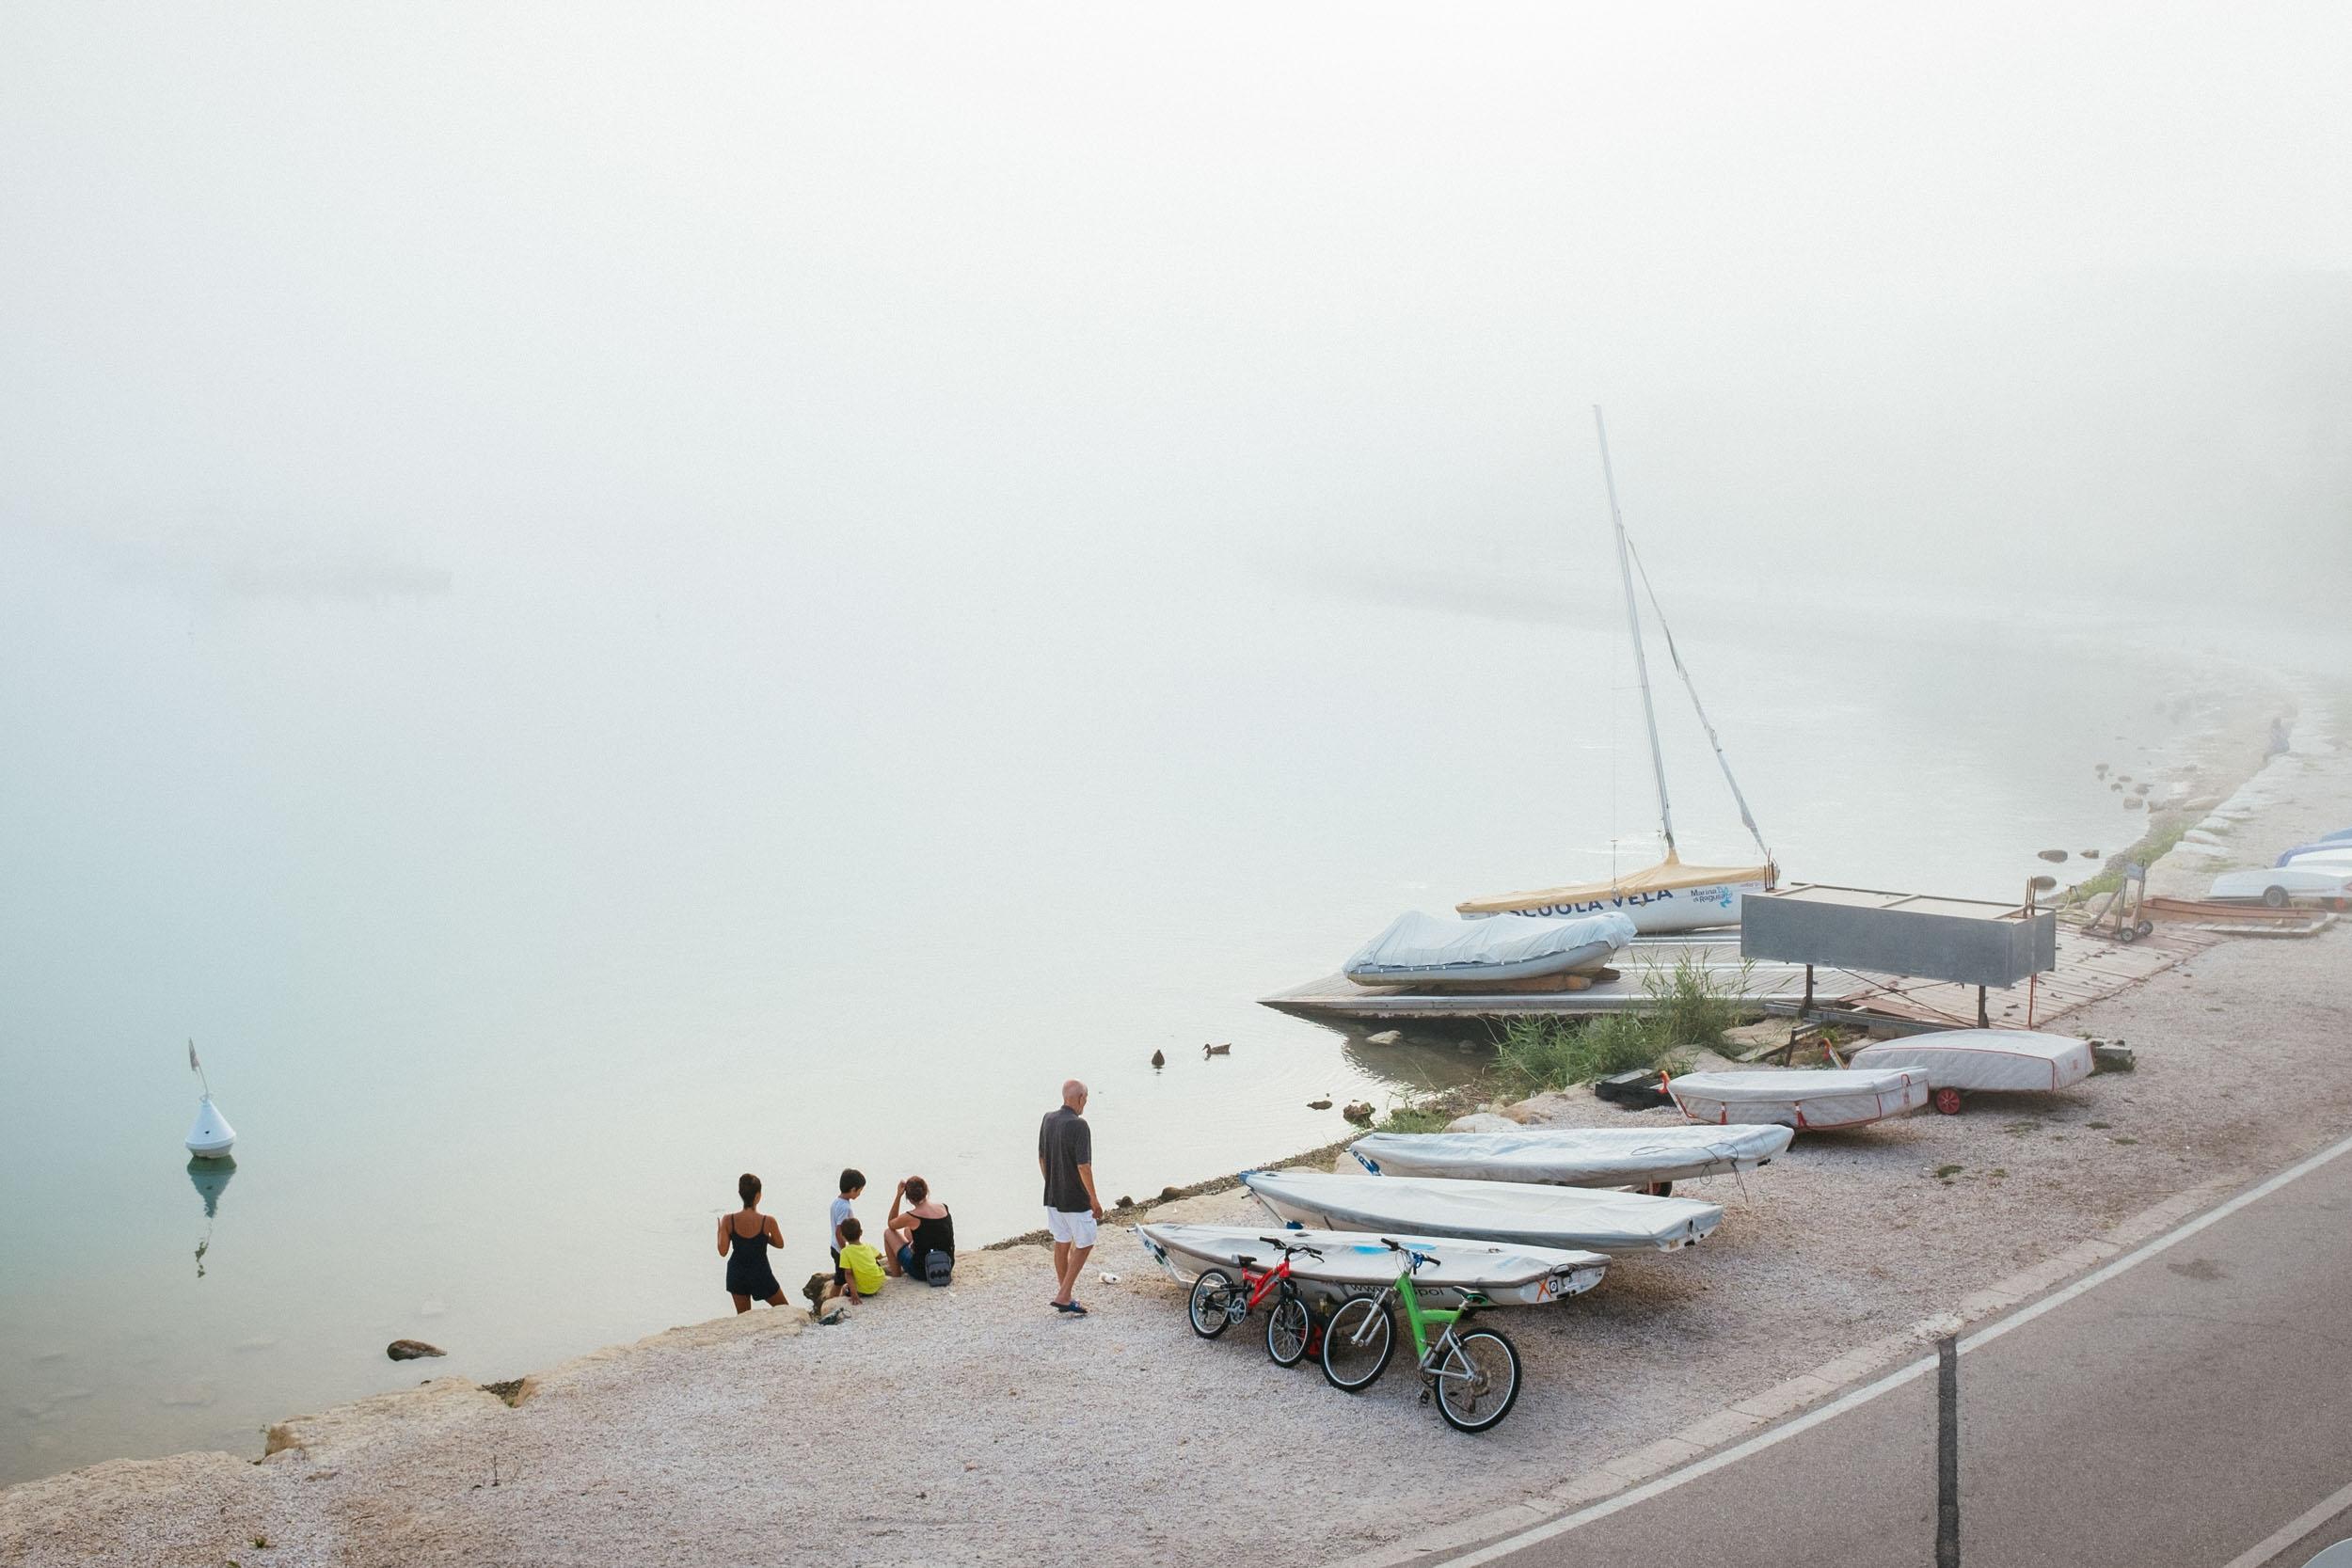 Giuliano-Berti-Lupa-Ragusa-Sicily-Mist-10.jpg